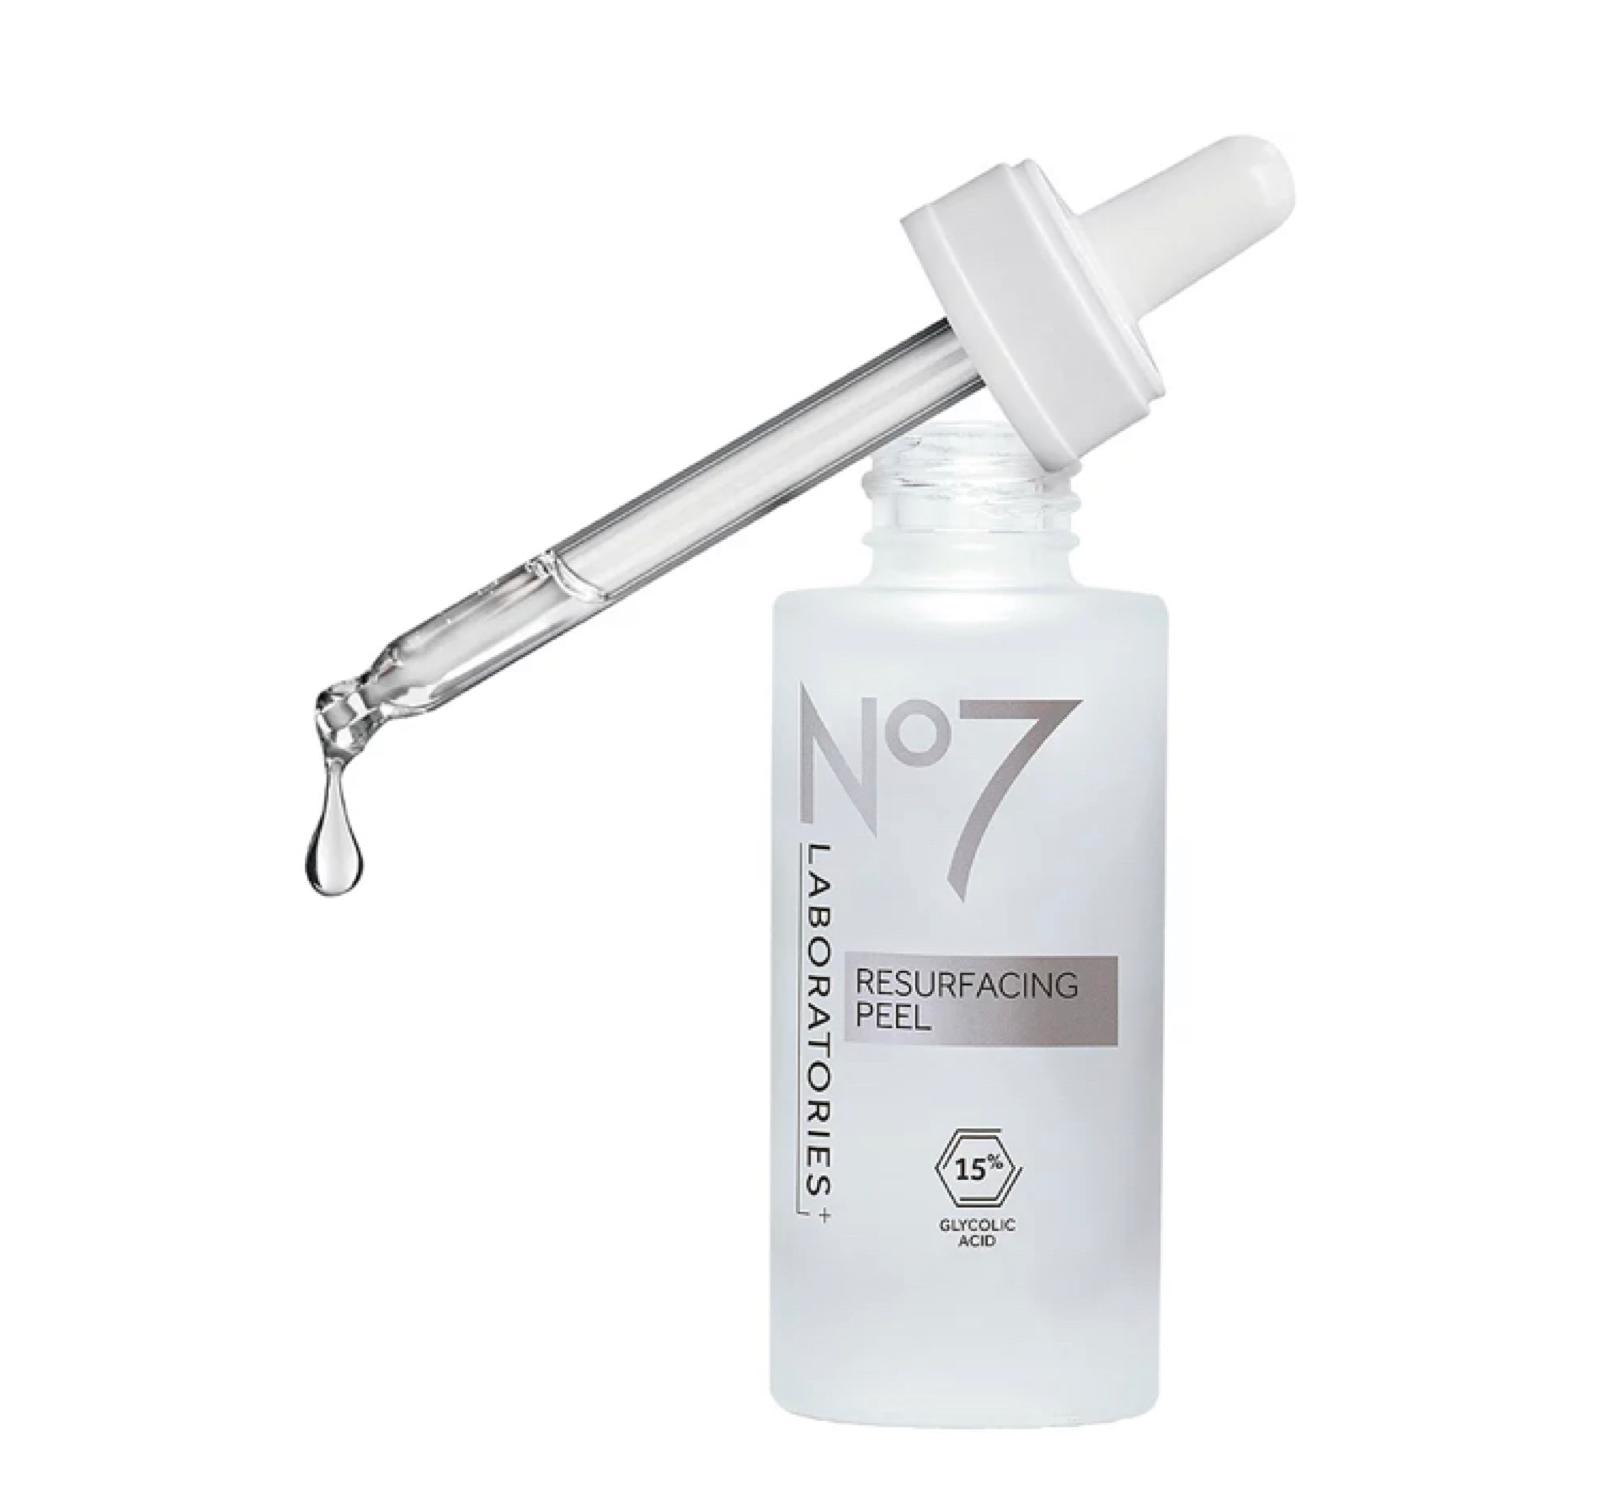 No7 Laboratories Resurfacing Peel 15% Glycolic Acid